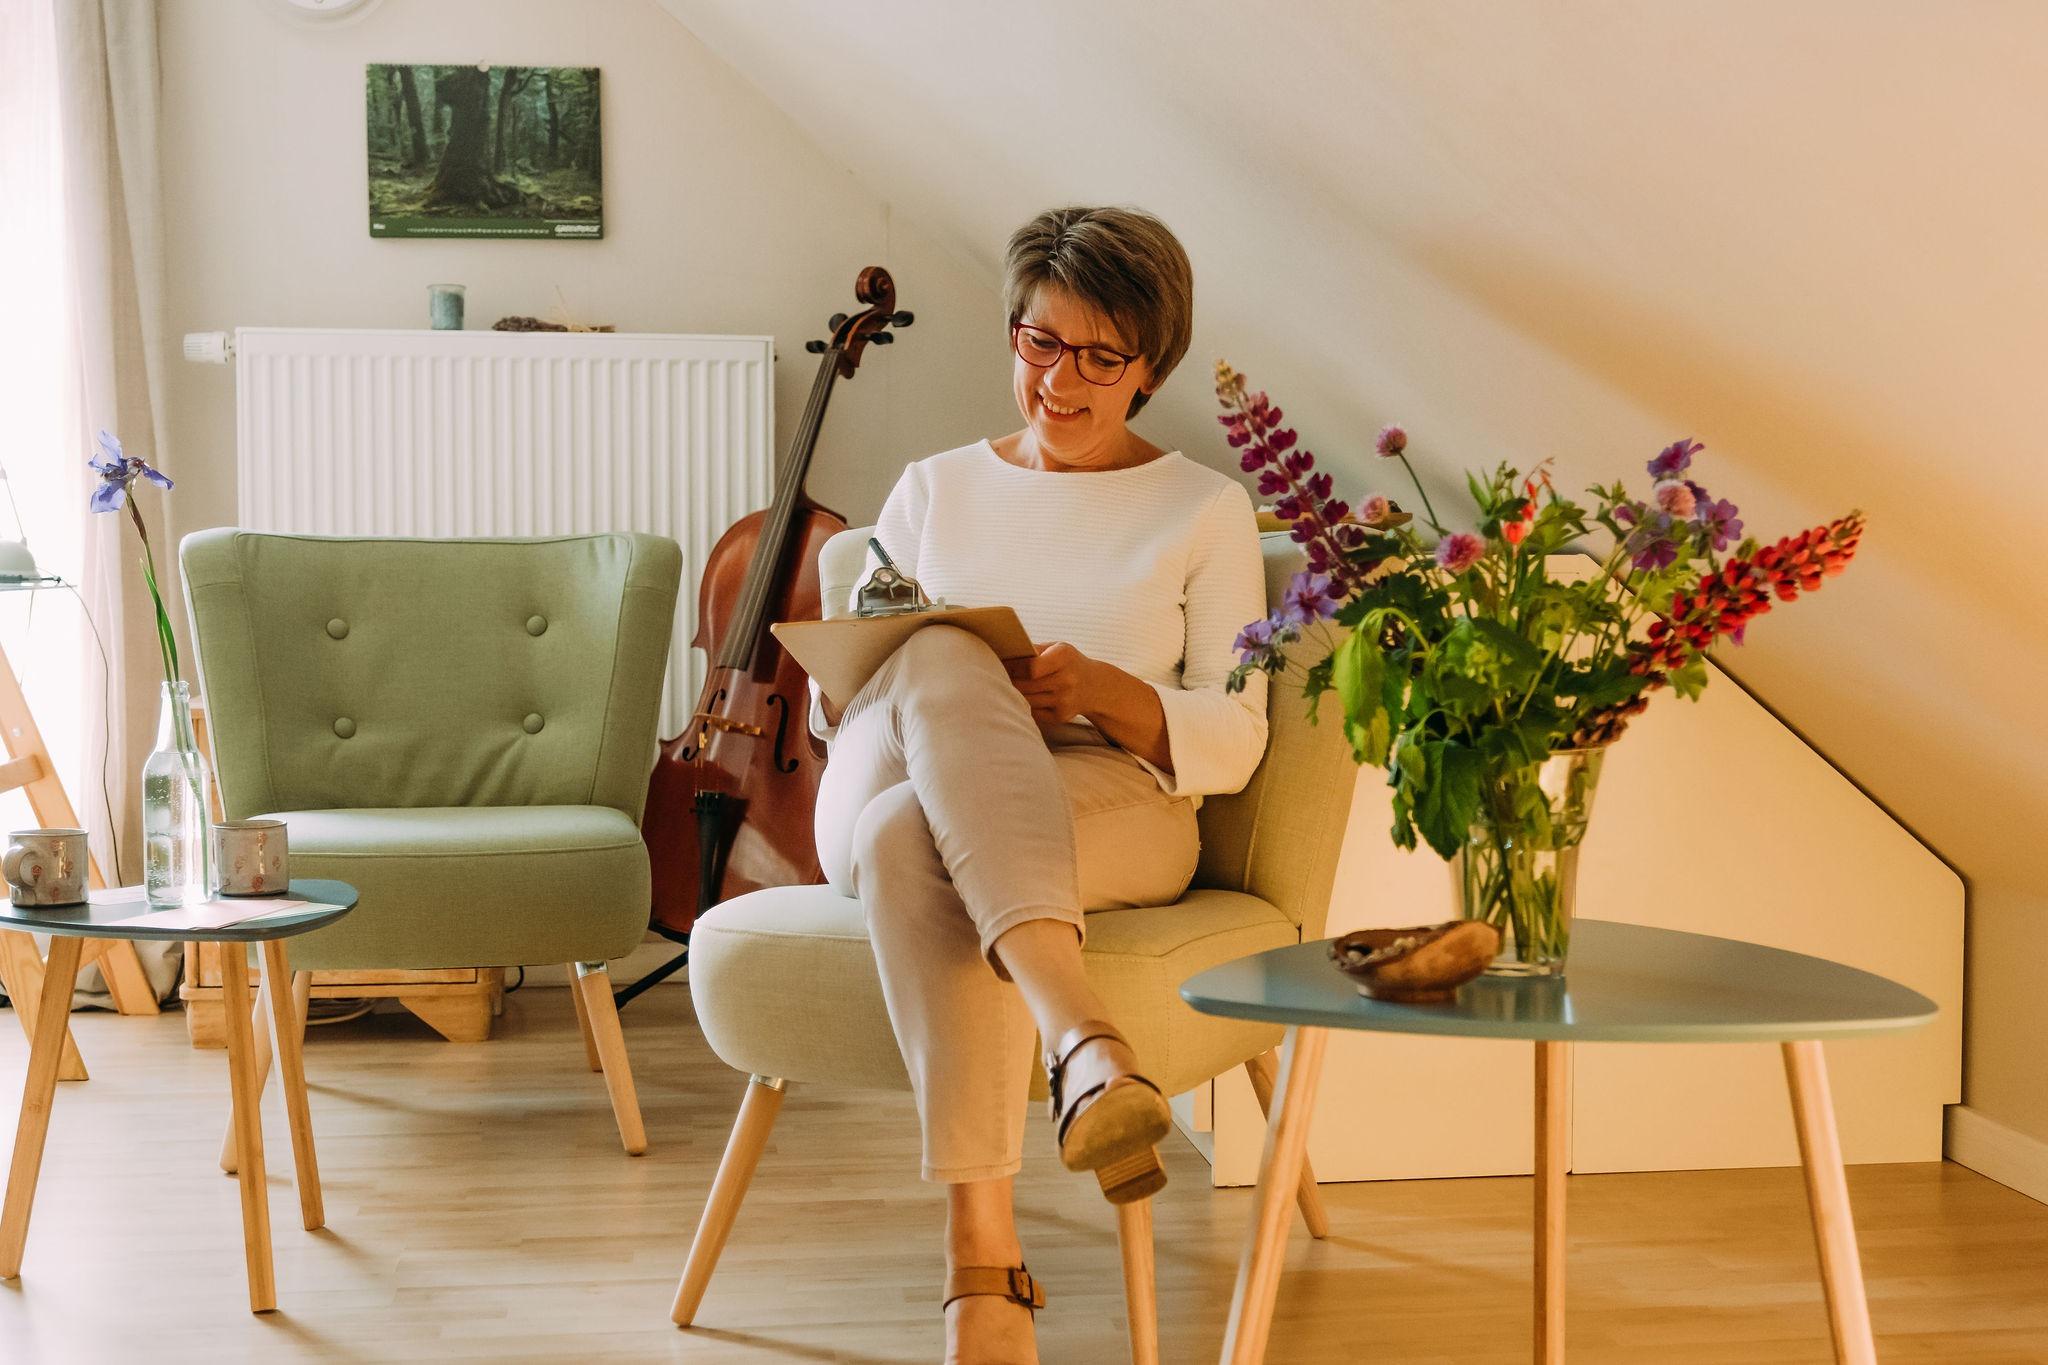 "<a href=""http://loesungswege-coaching.de/"">Kerstin Werner-Schlüter - Lösungswege Coaching</a>"